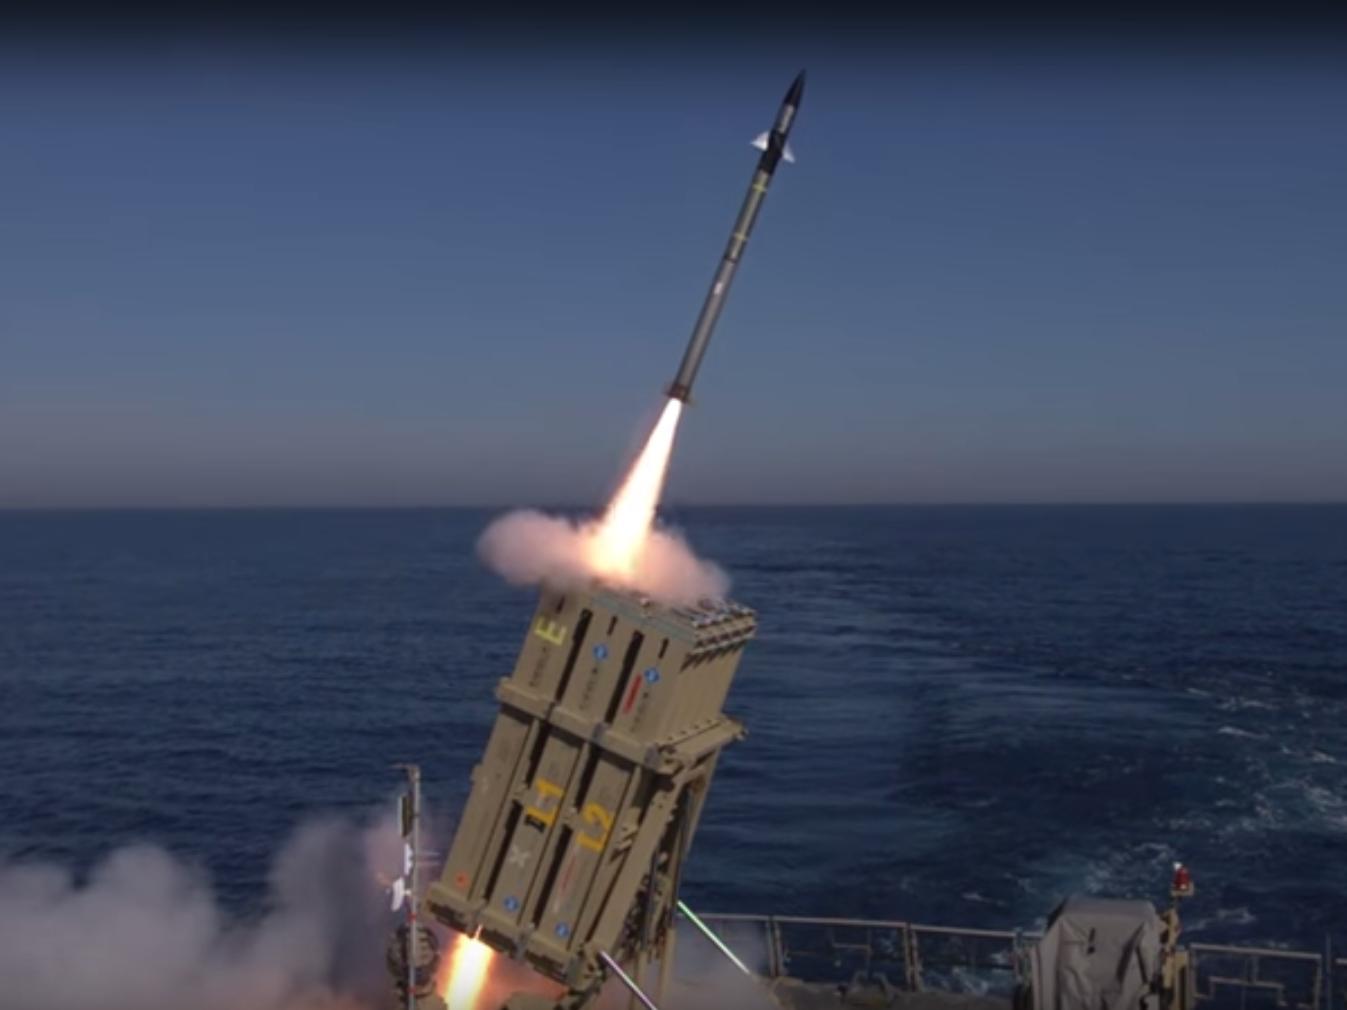 Missile shake #4